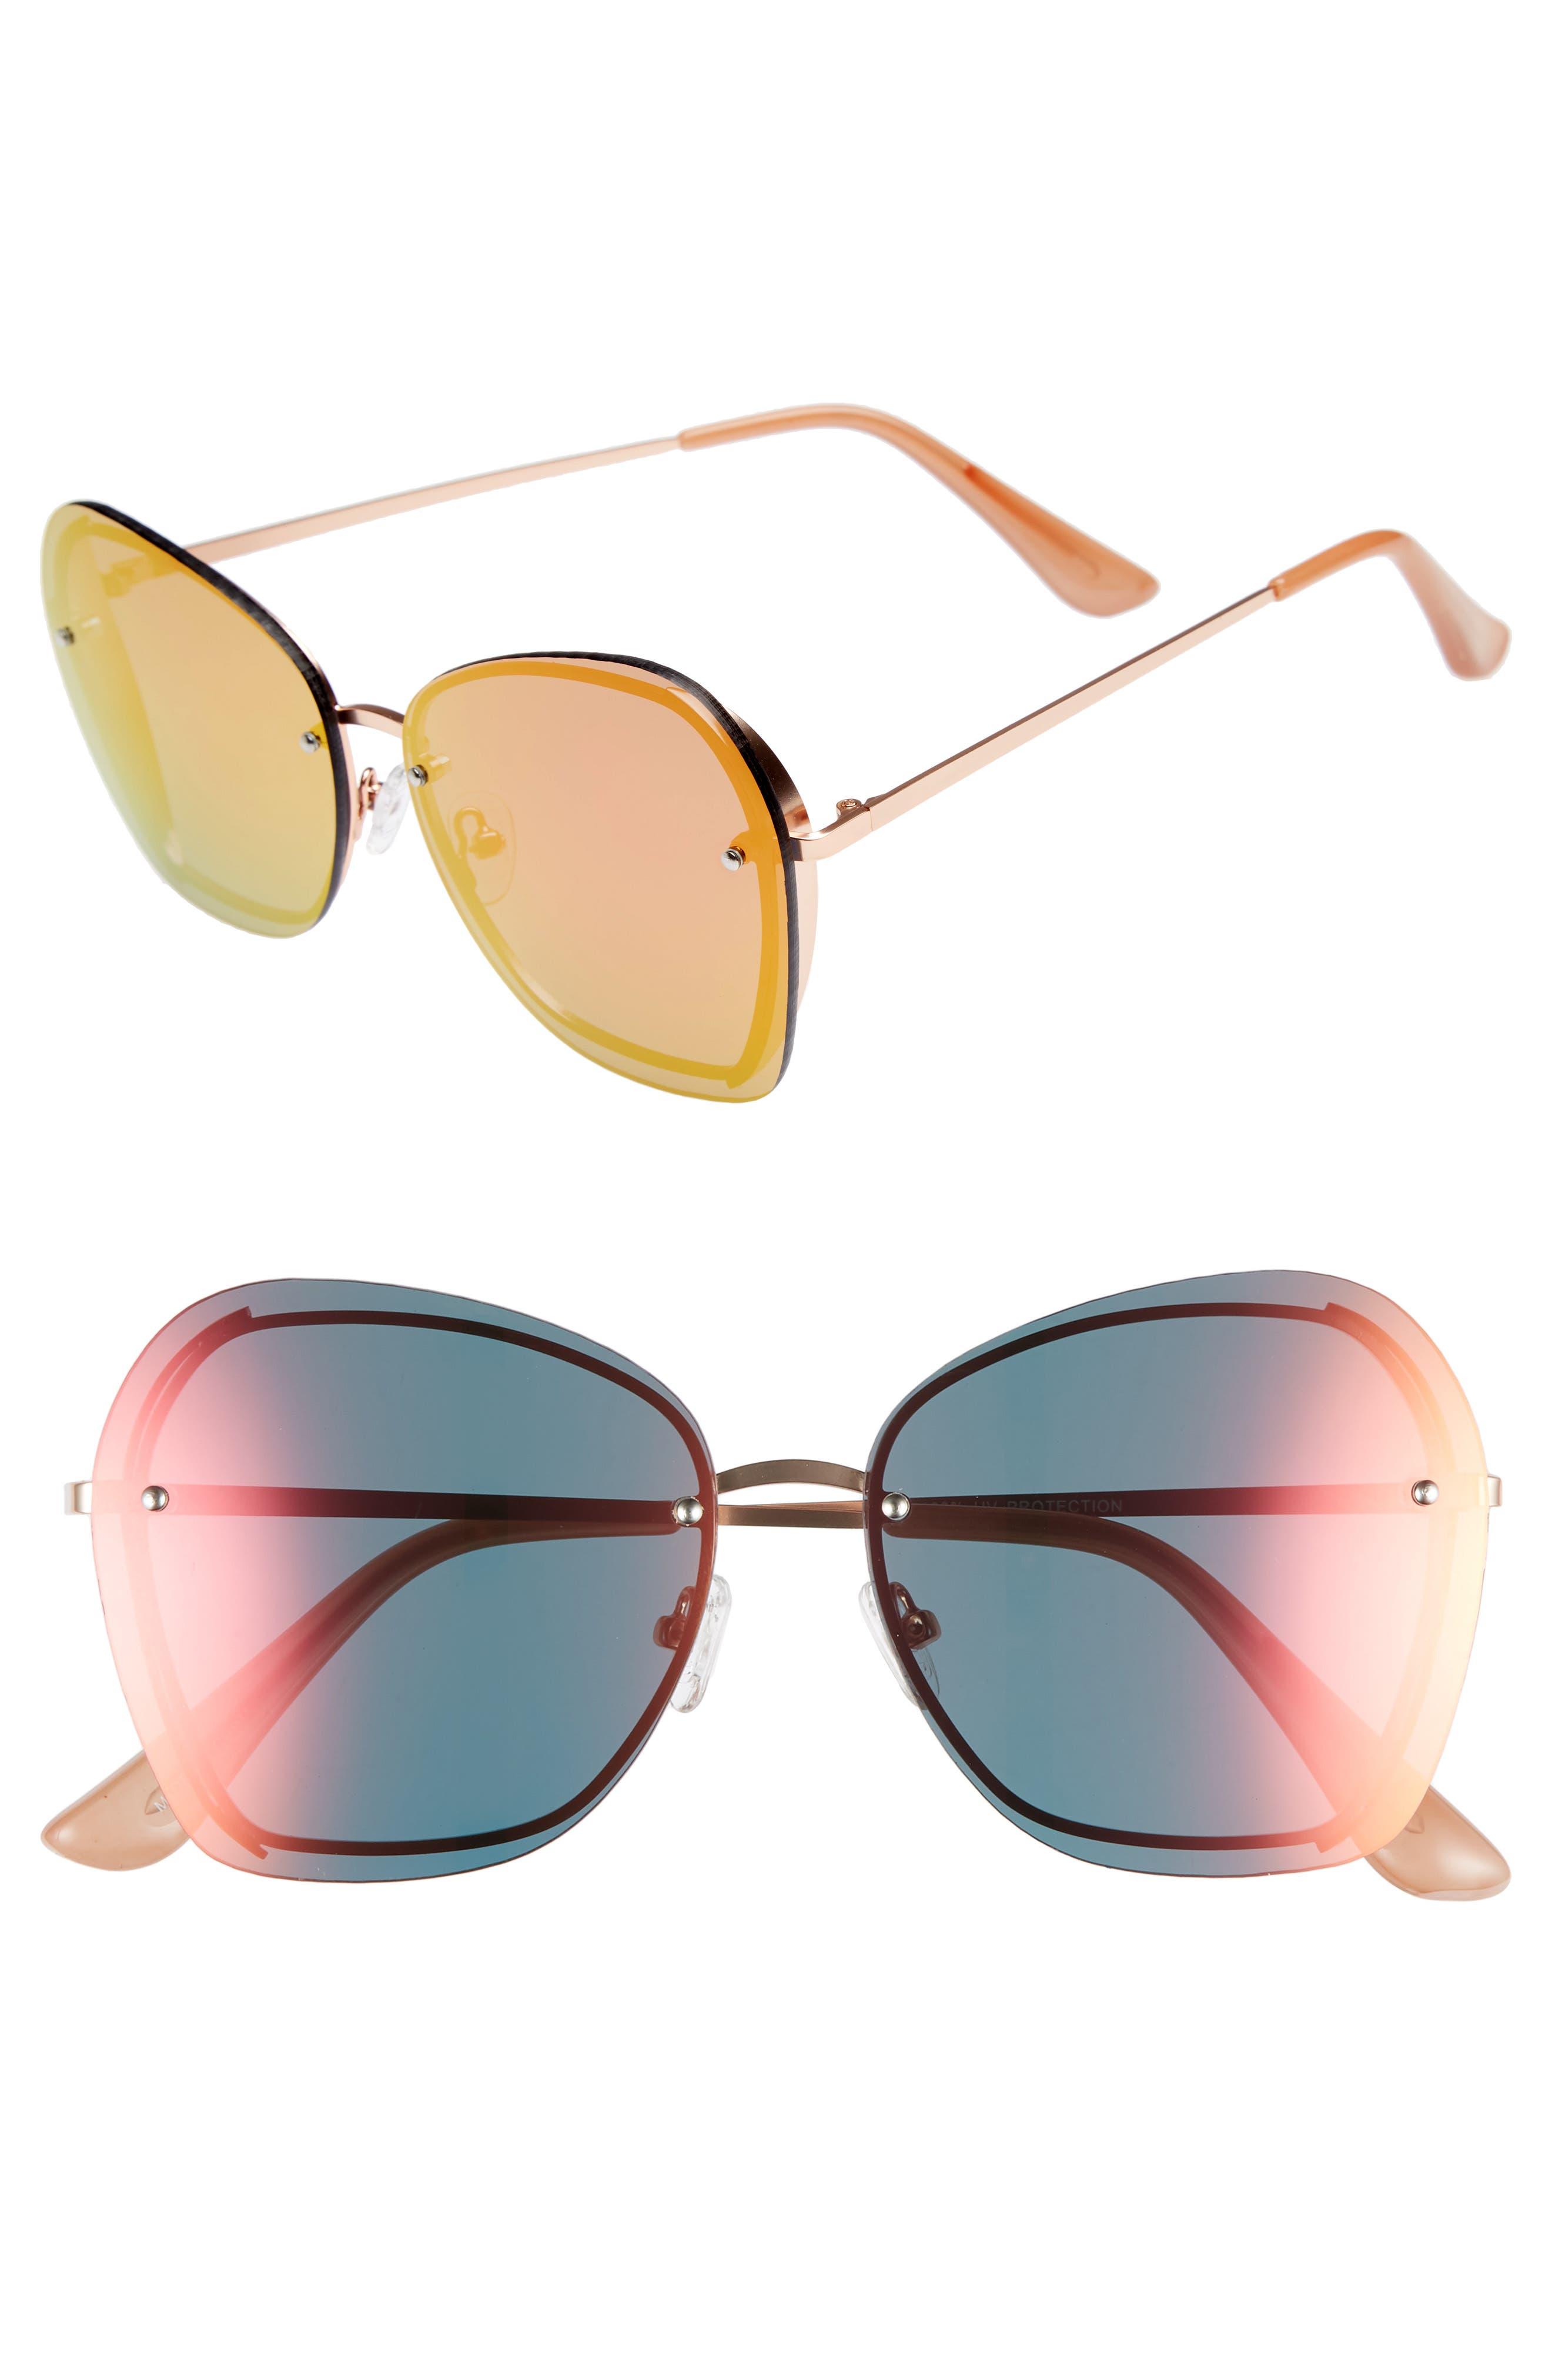 61mm Rimless Square Sunglasses,                             Main thumbnail 1, color,                             Rose Gold/ Rose Gold